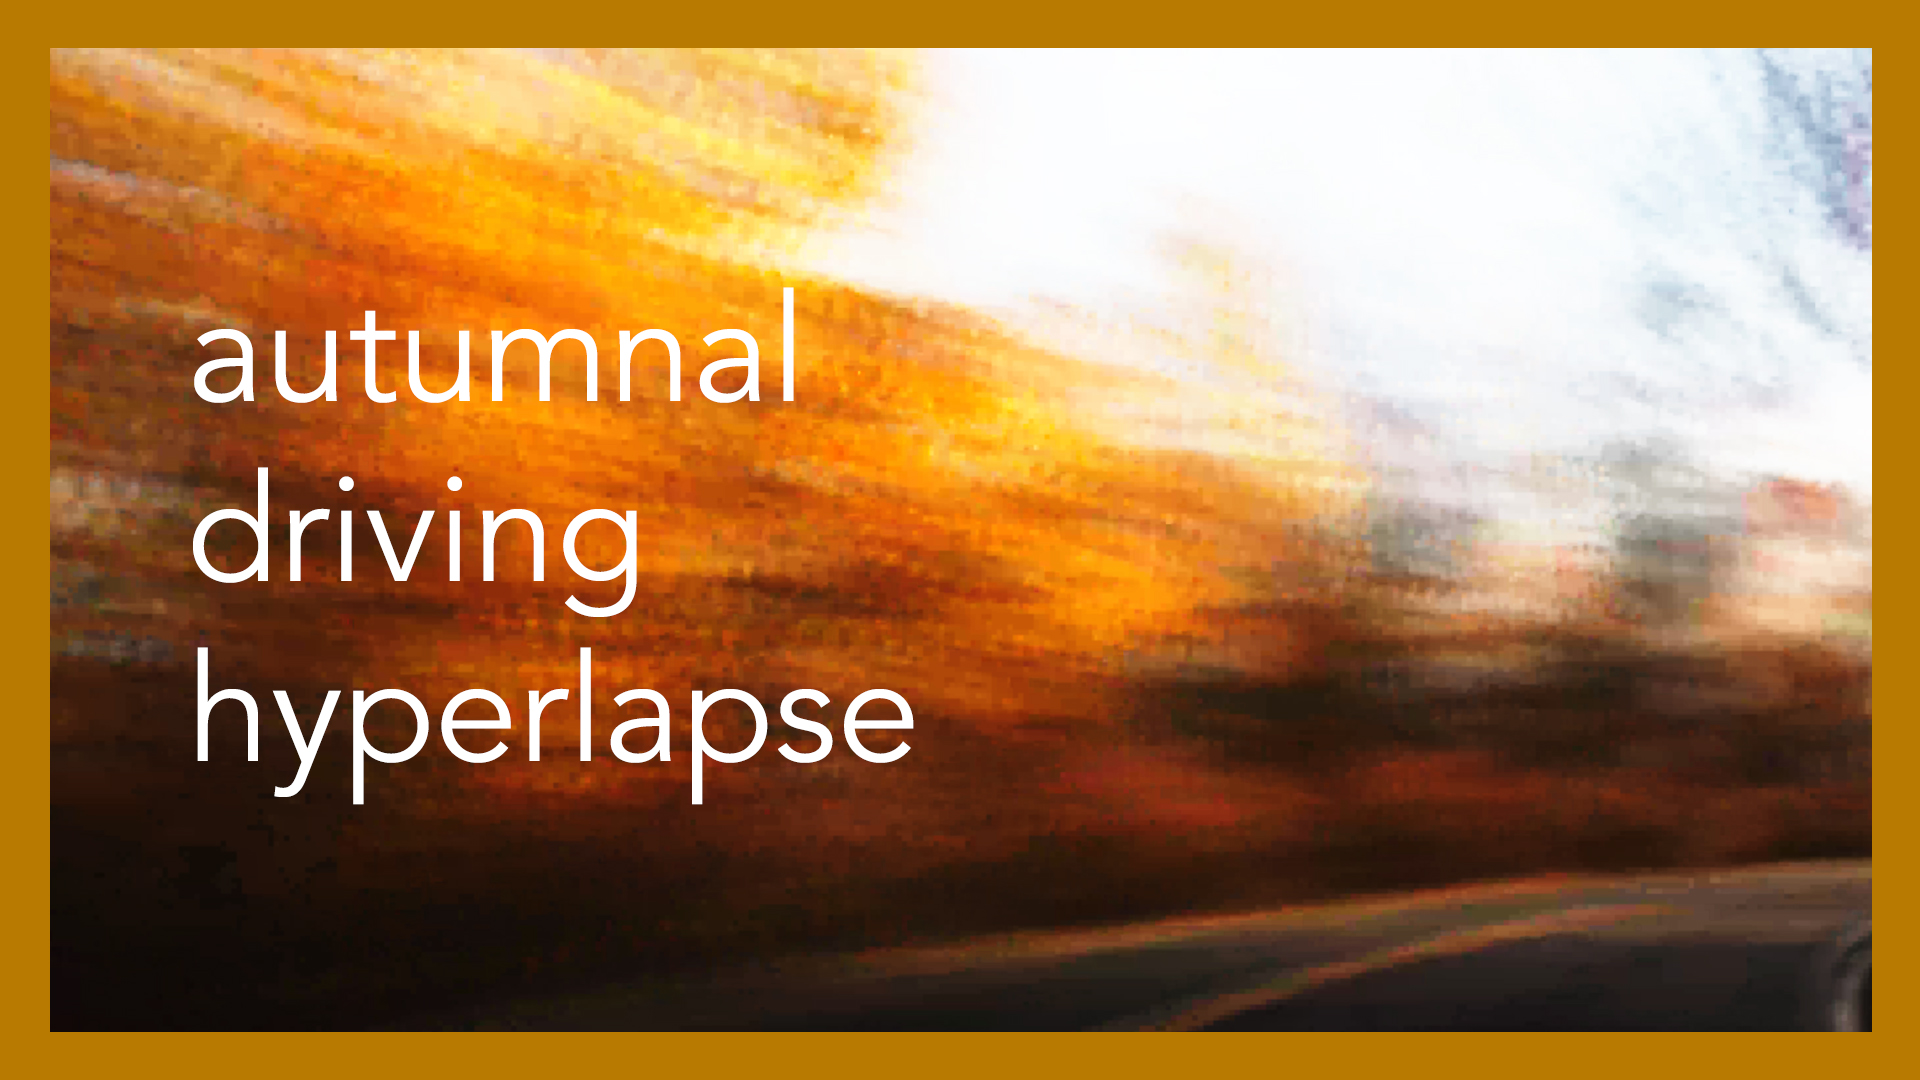 Autumnal Driving Hyperlapse